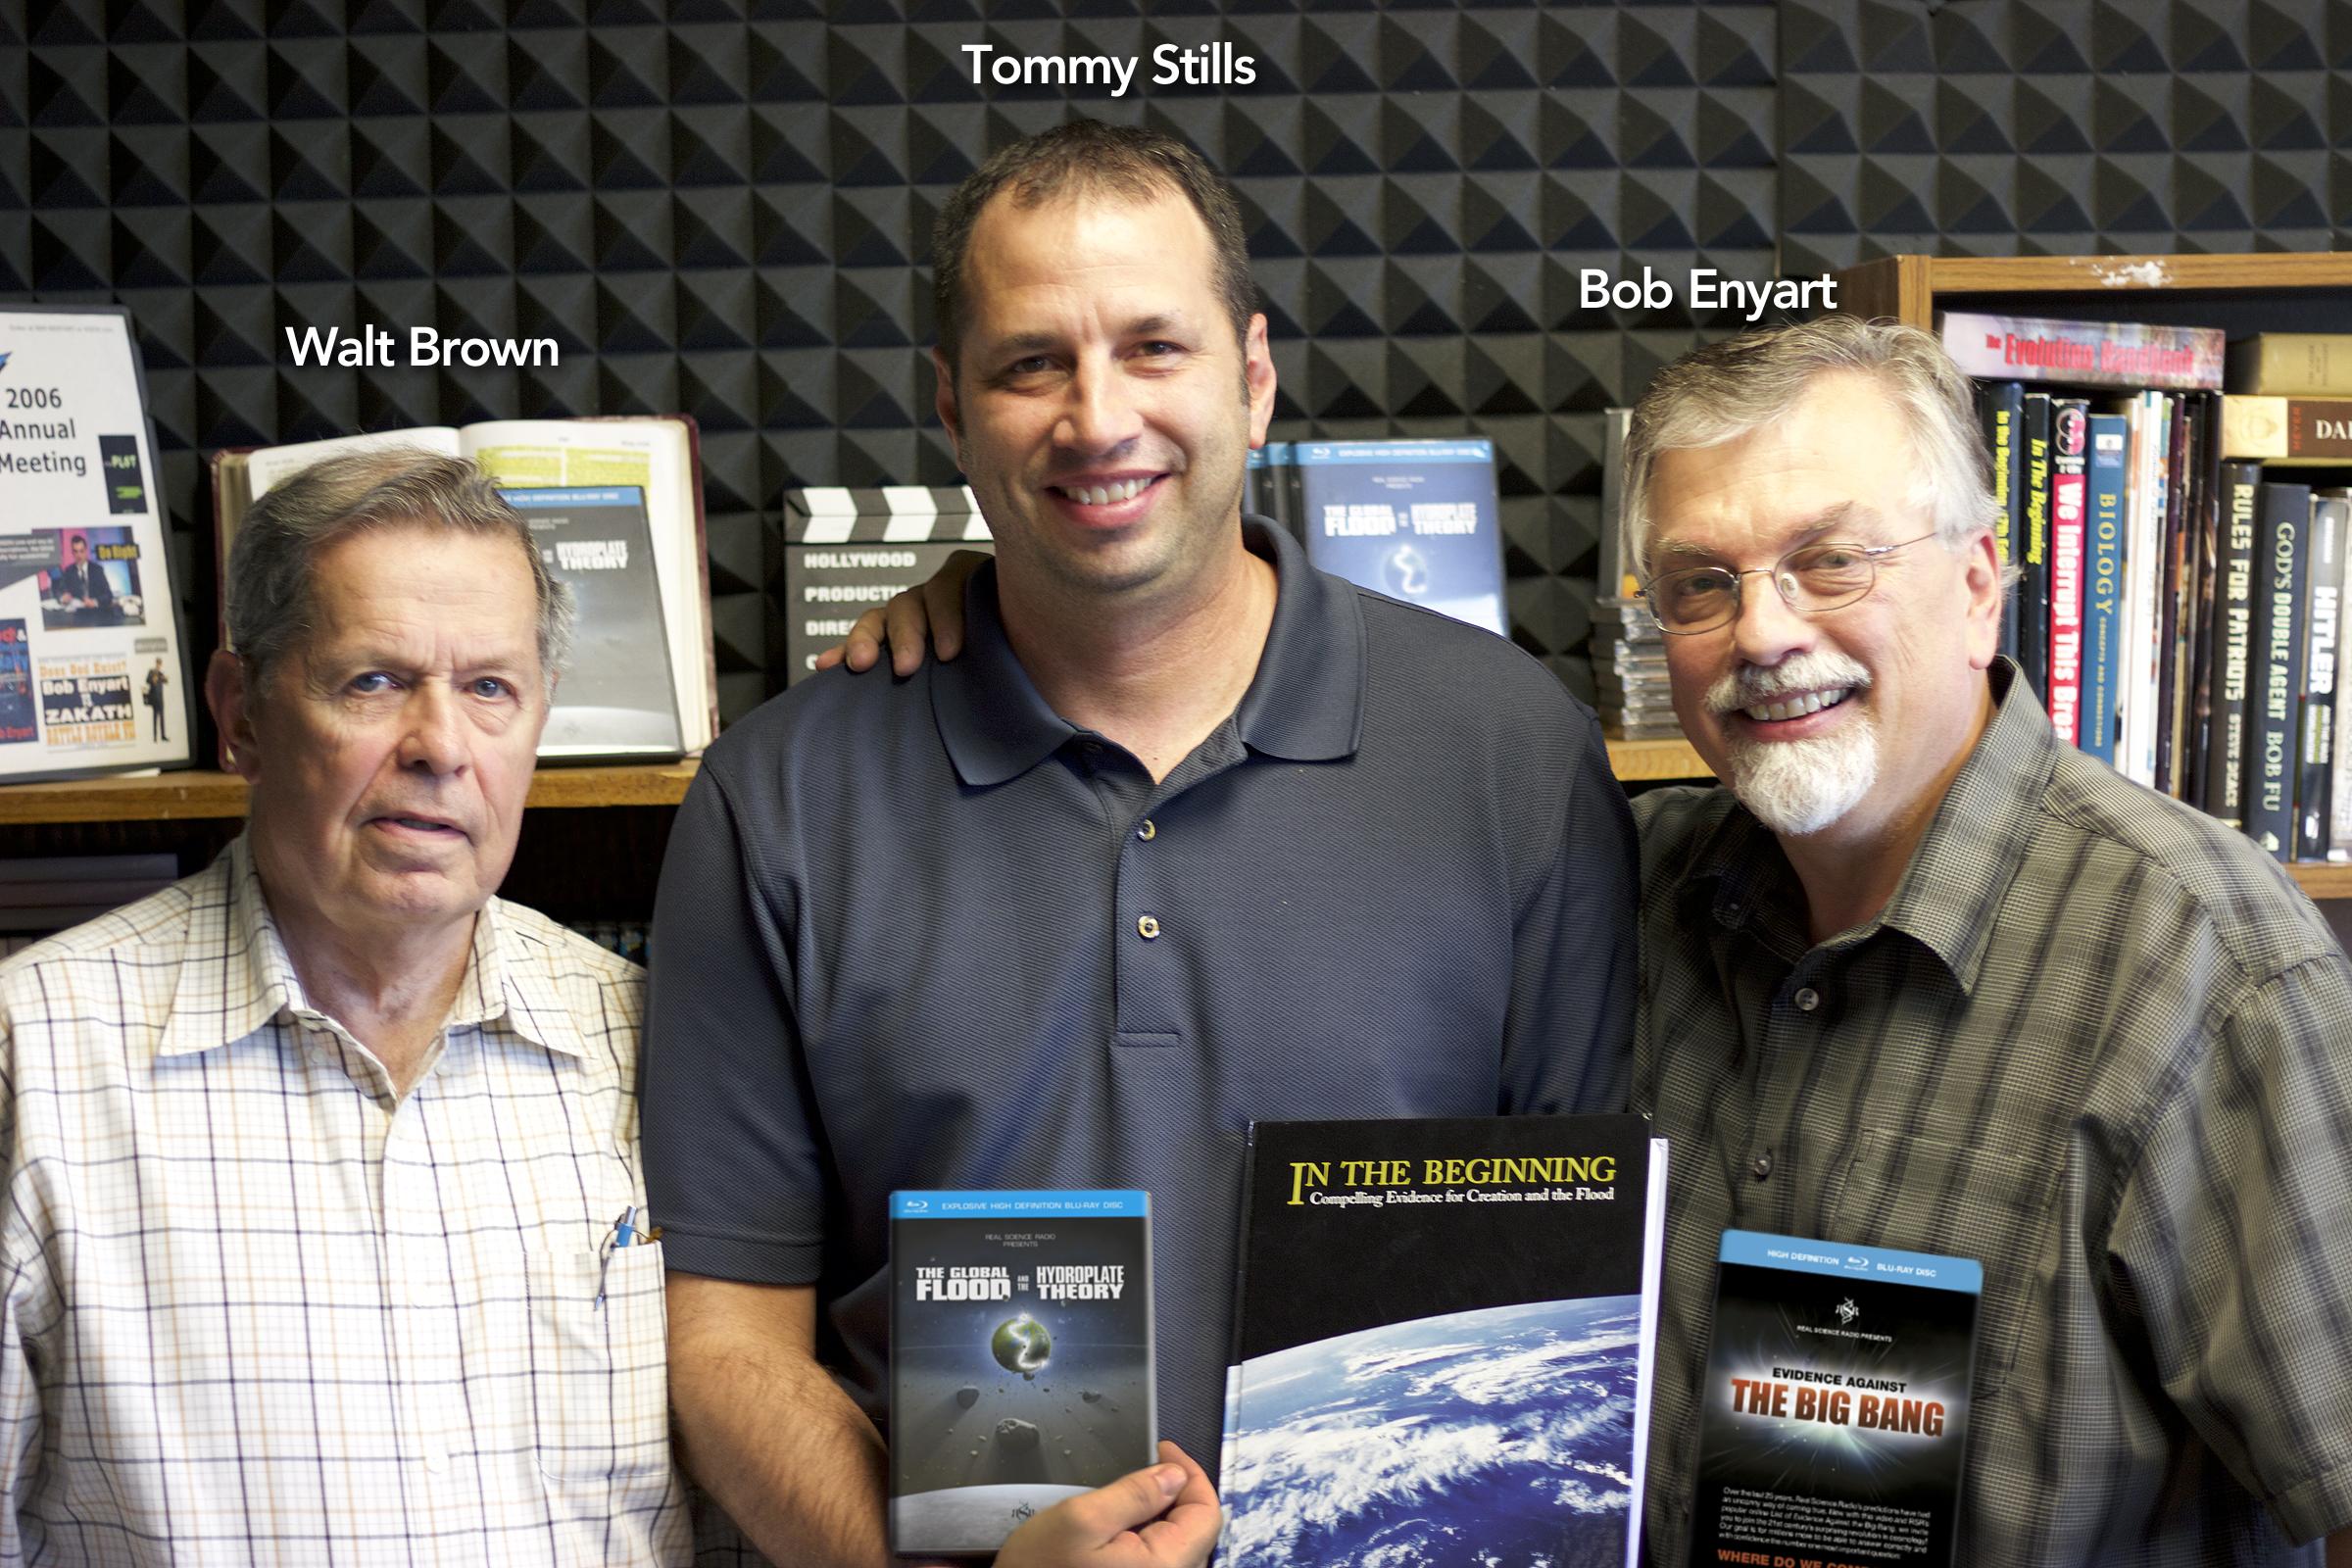 Walt Brown, editor of RSR's Hydroplate Theory video Tommy Stills, Bob Enyart